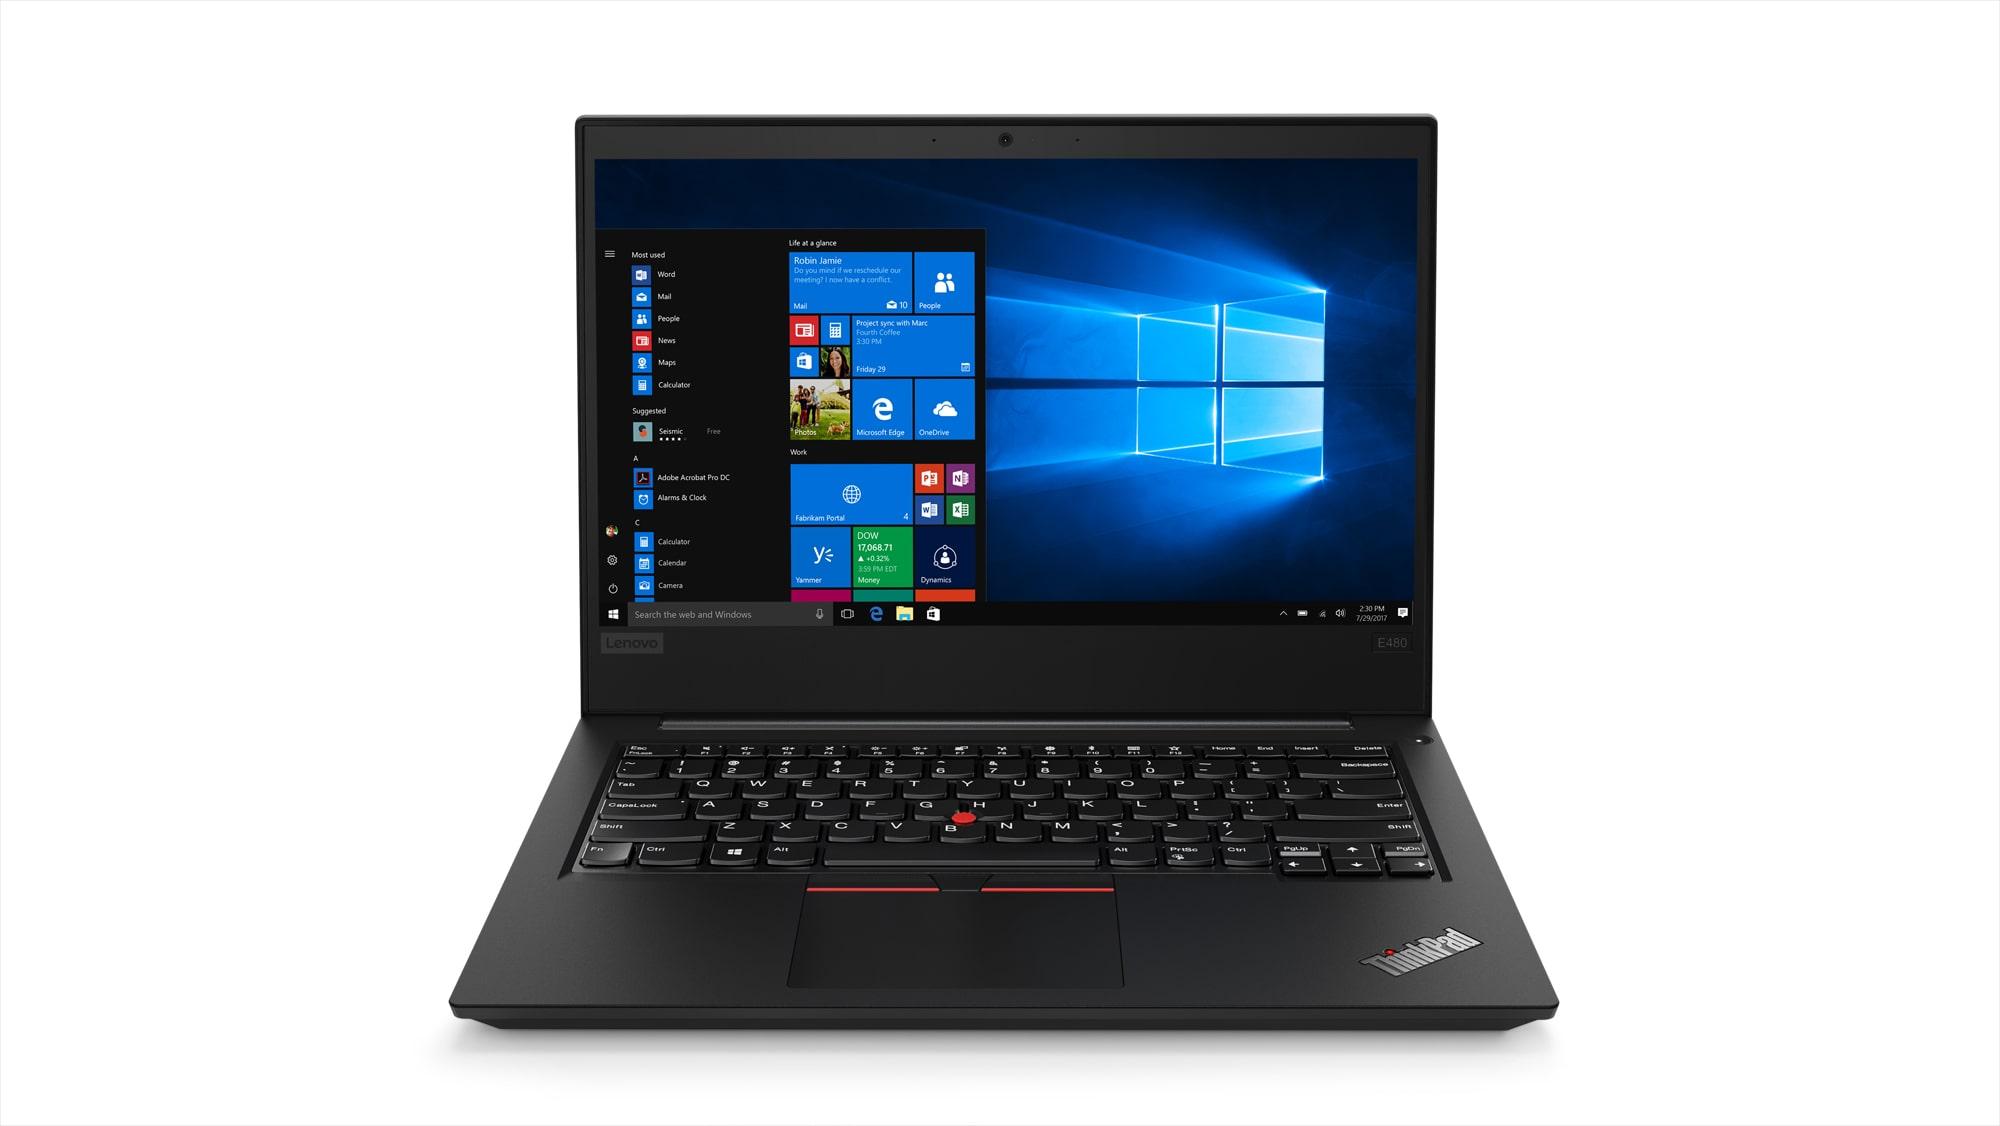 Lenovo Thinkpad E480 Laptop (Windows 10, 4GB RAM, 1000GB HDD, Intel Core i3, Black, 14.1 inch)